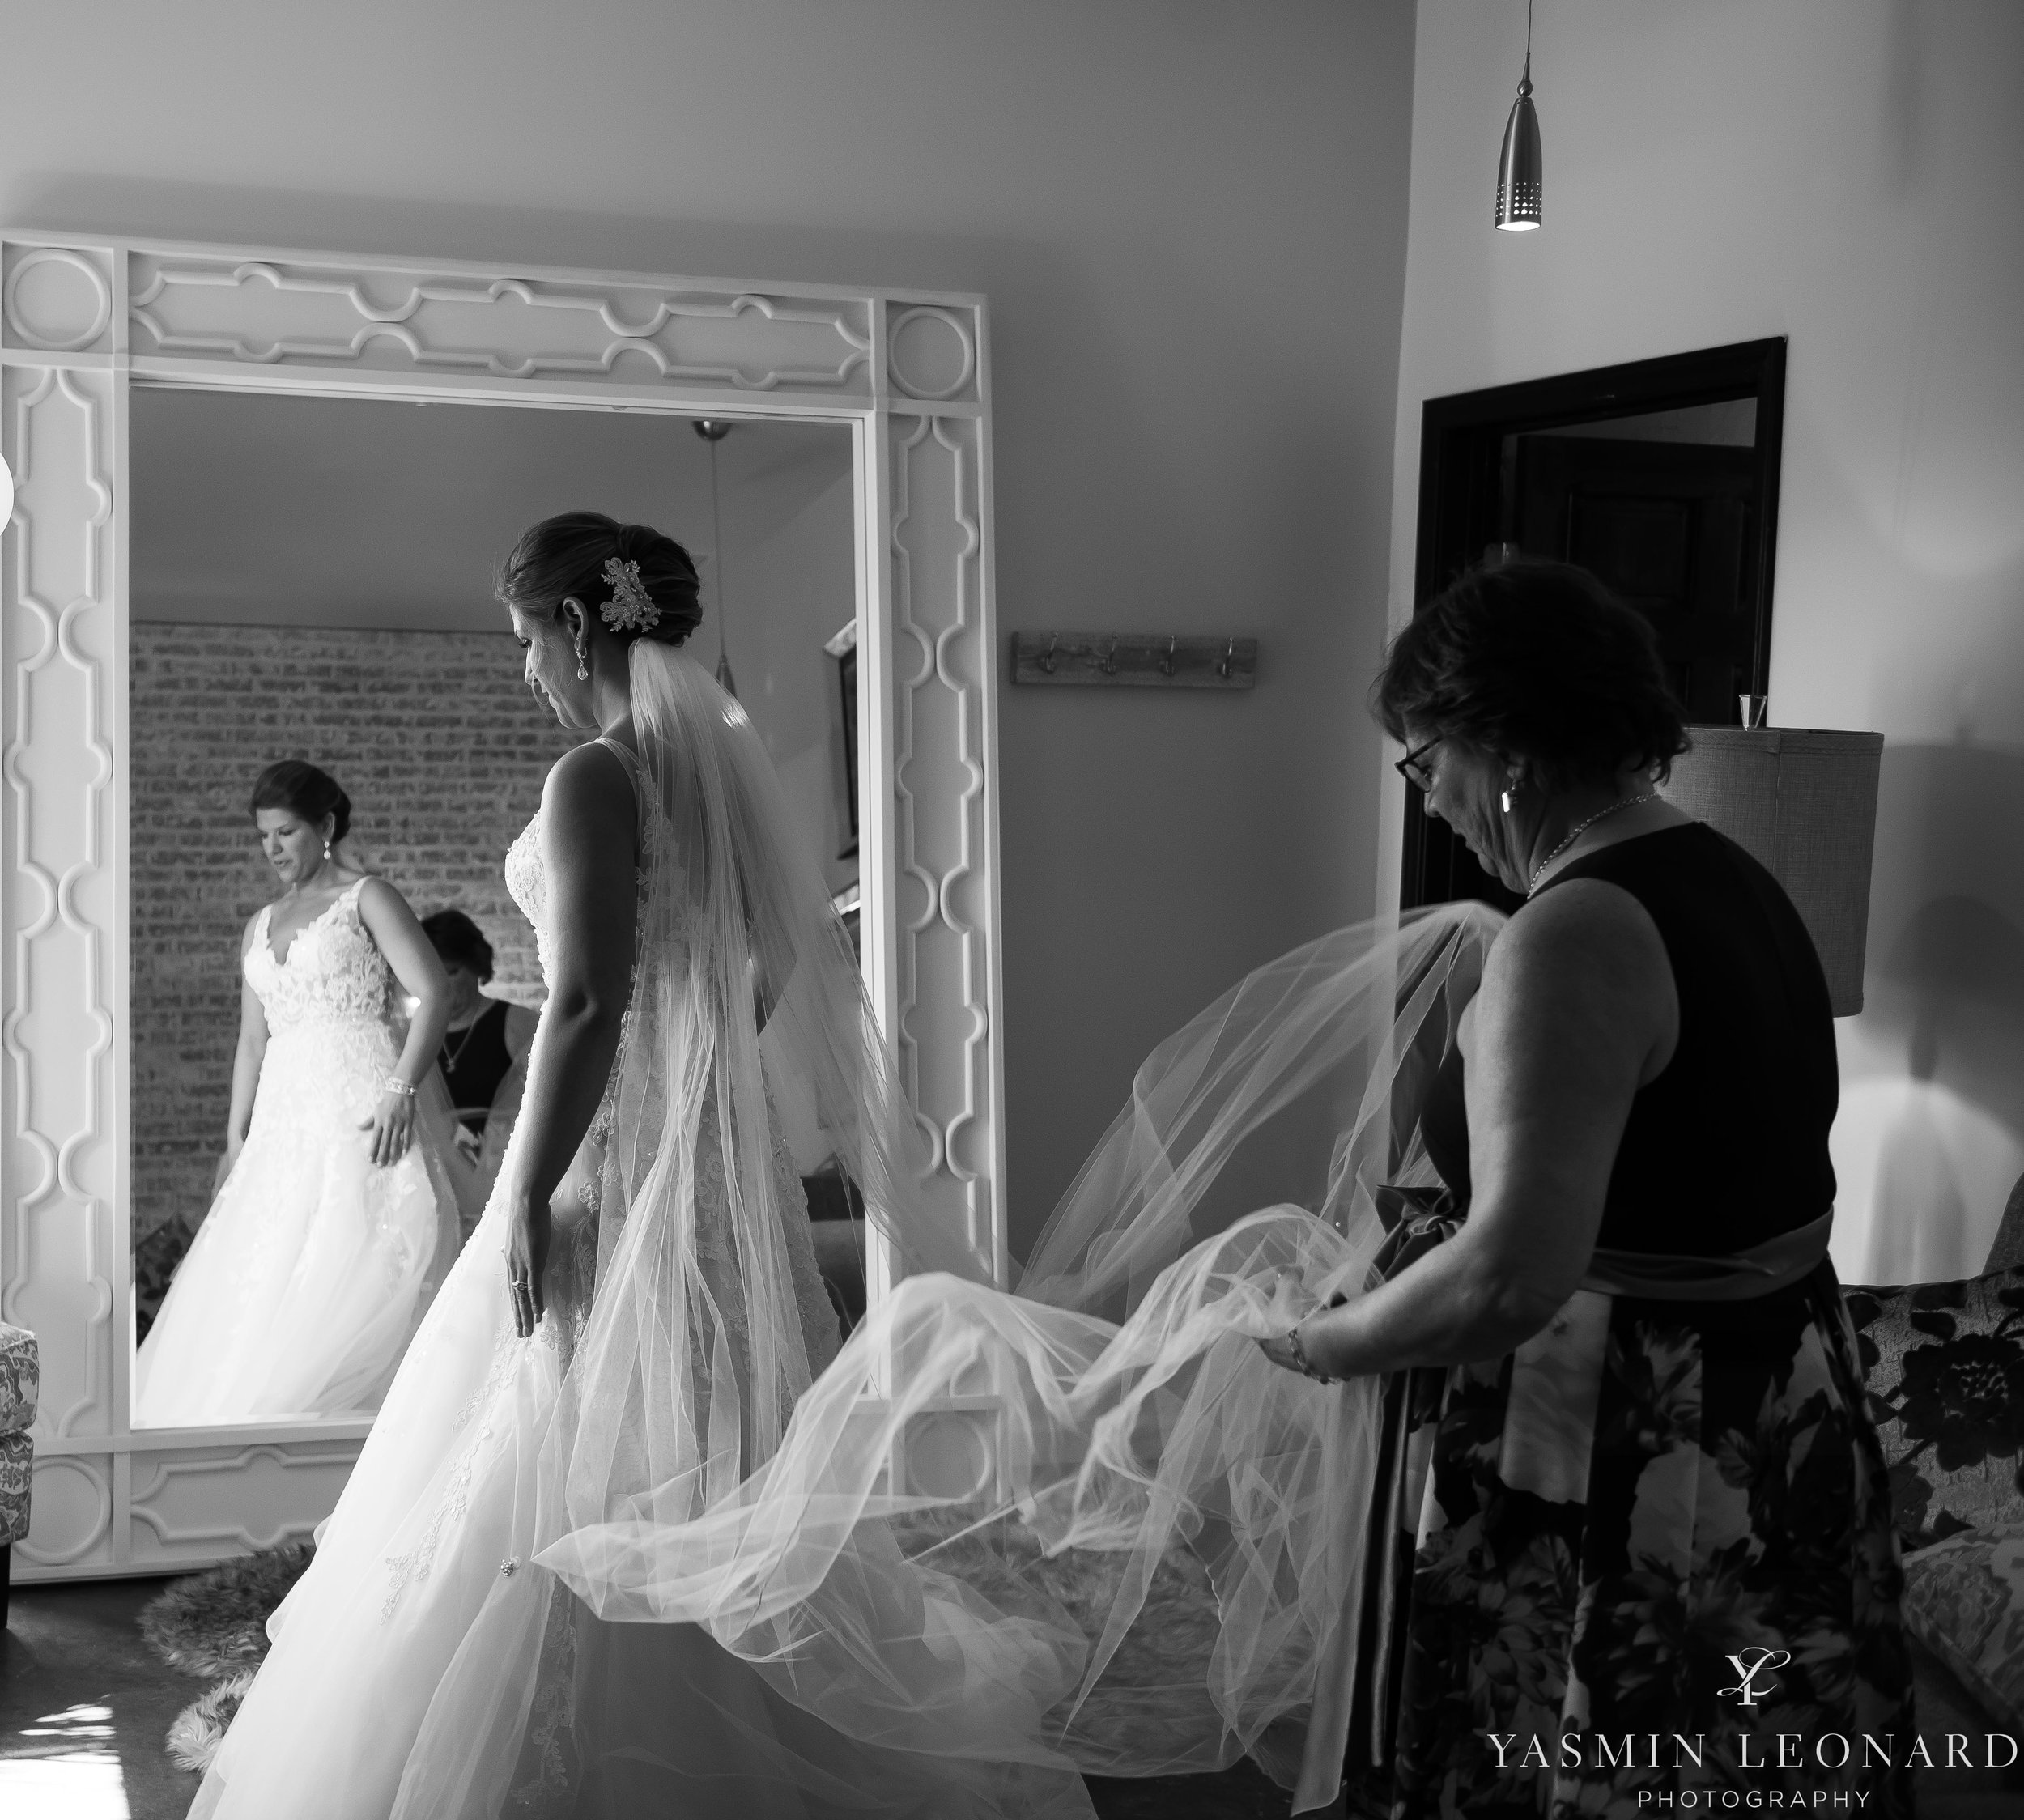 Adaumont Farm - Adaumont Farm Weddings - Trinity Weddings - NC Weddings - Yasmin Leonard Photography-11.jpg